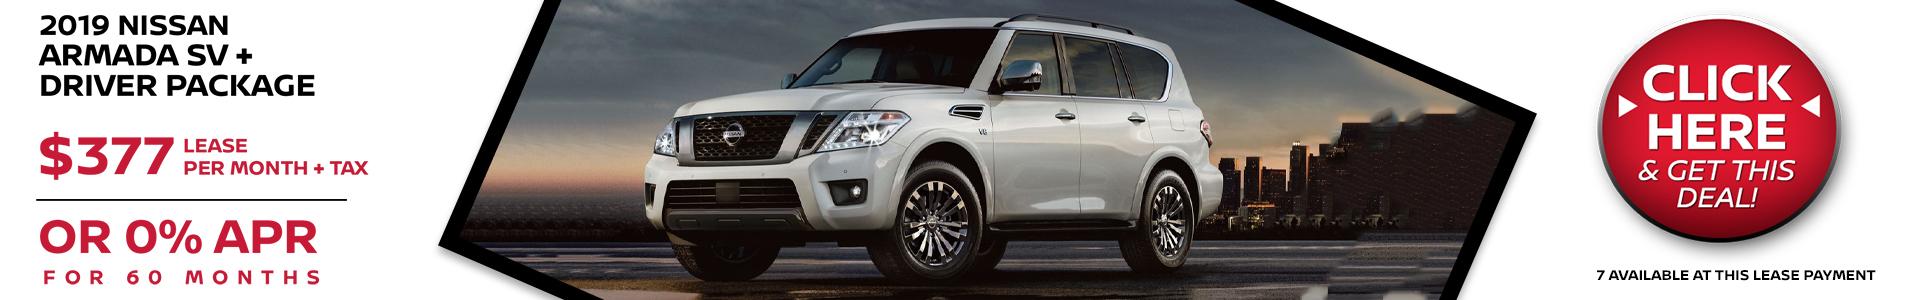 Mossy Nissan - Nissan Armada $377 Lease